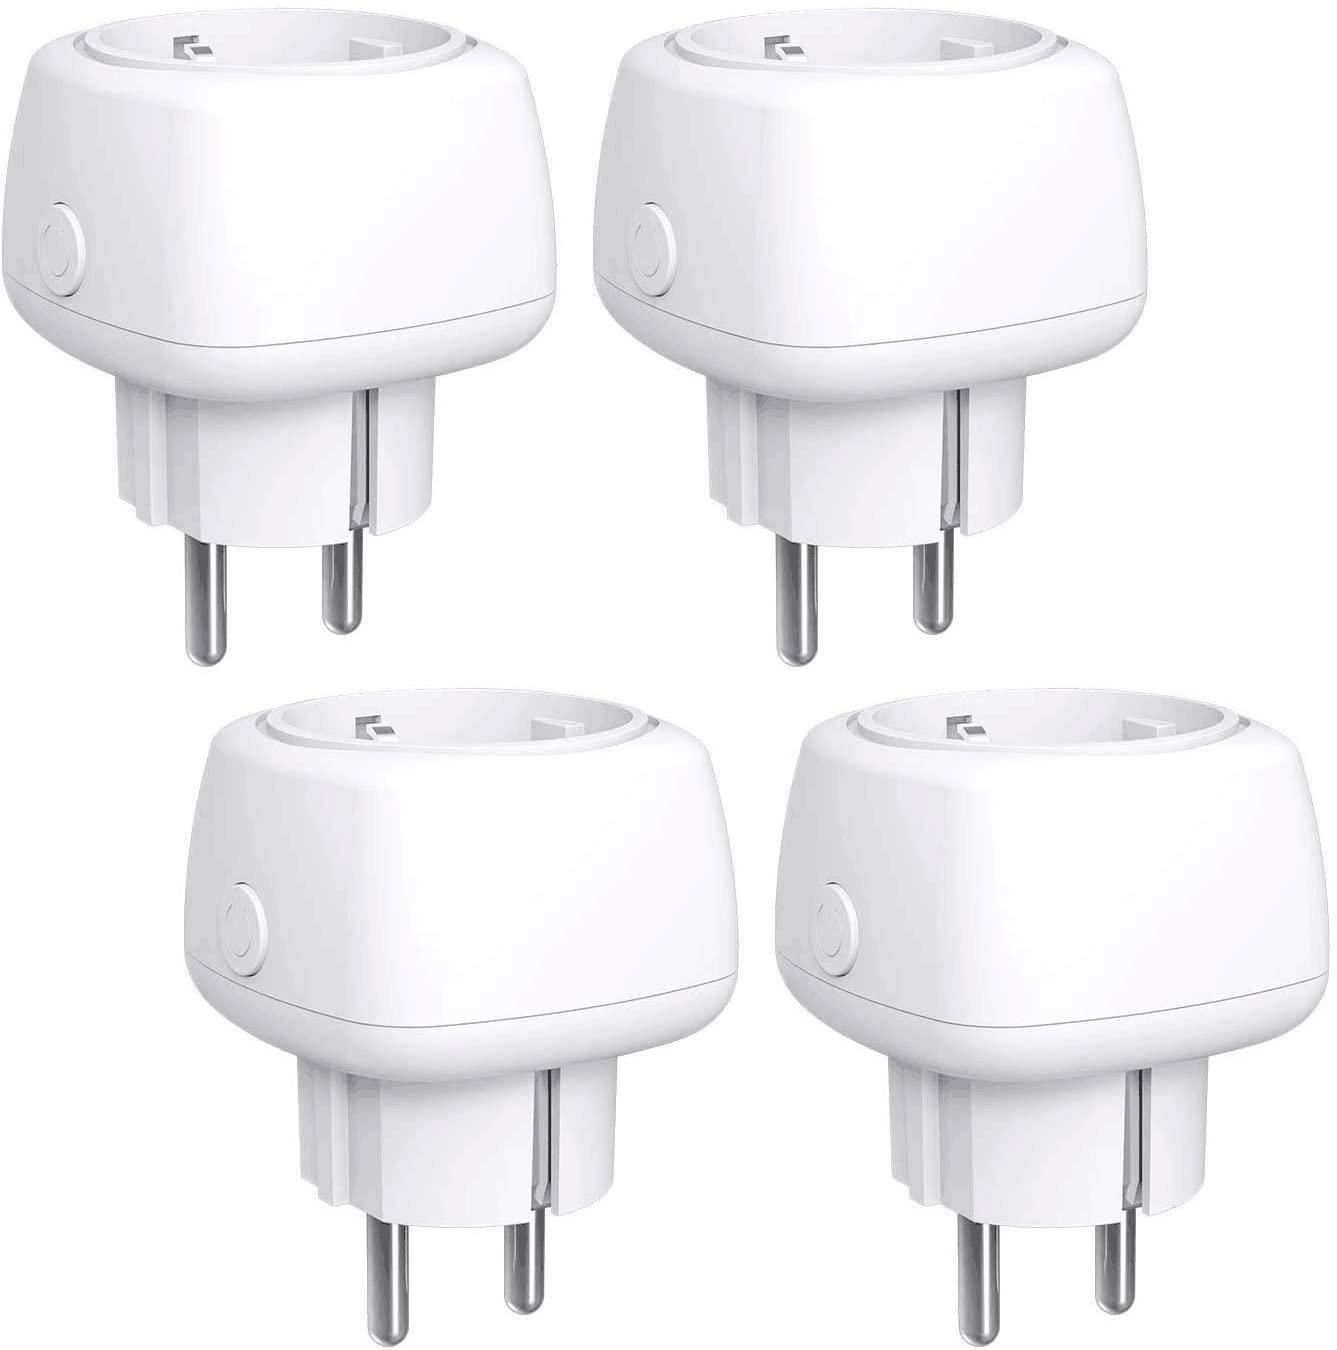 4x Meross Smart WLAN stopcontact (Alexa, Google Home, IFTTT) @ Amazon.de